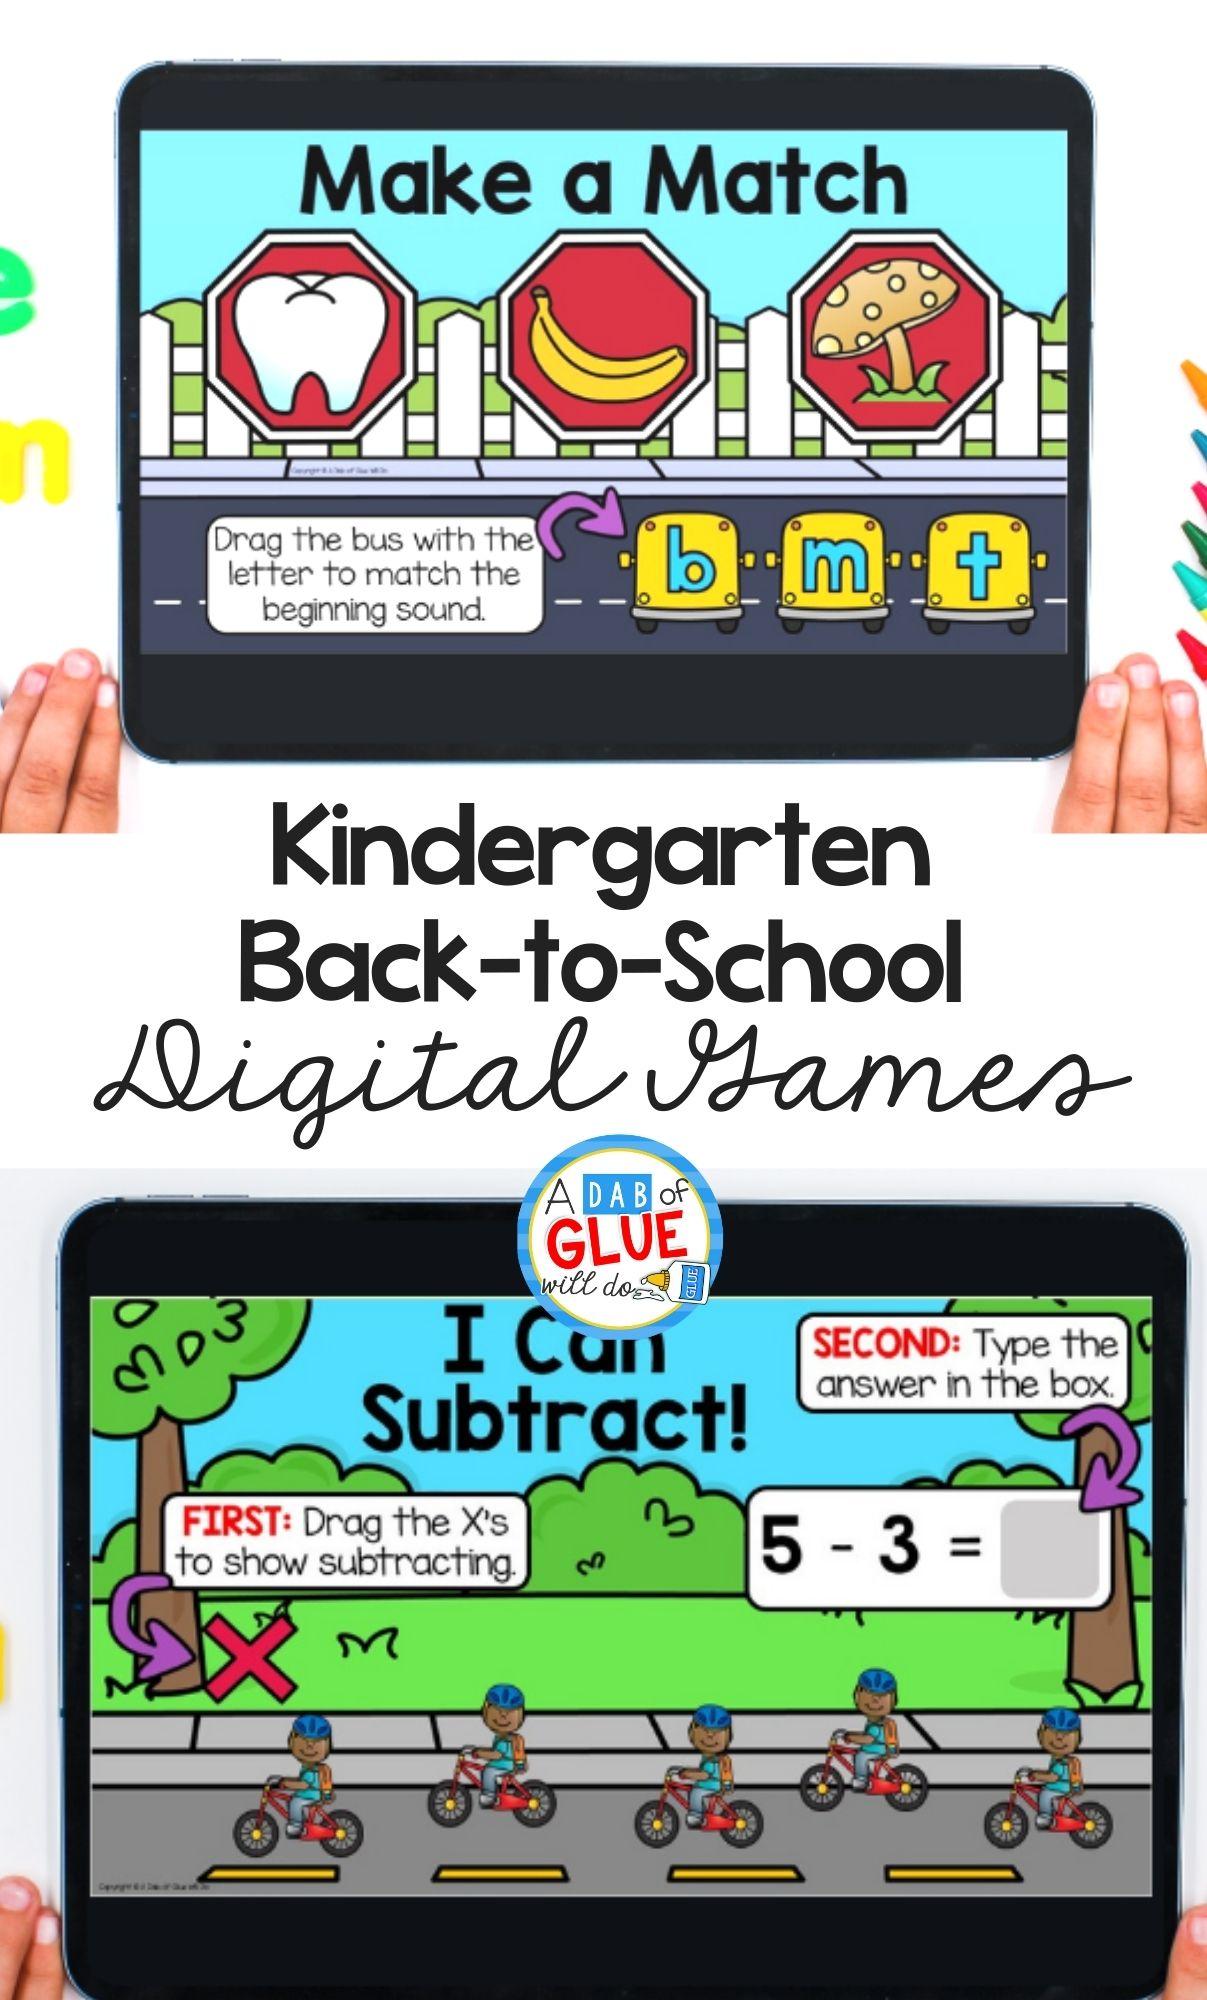 August and Back-to-School Digital Games for Kindergarten